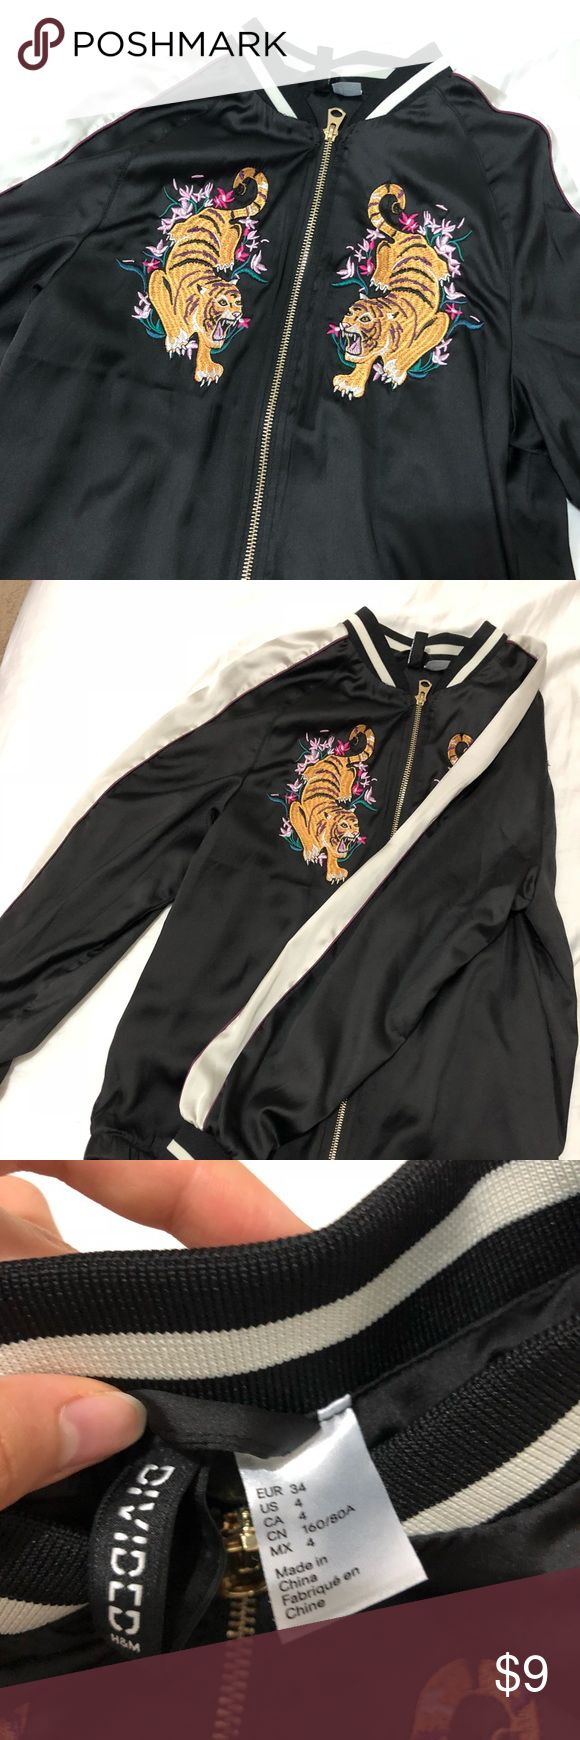 H&m twin tiger bomber jacket Bomber jacket, Jackets